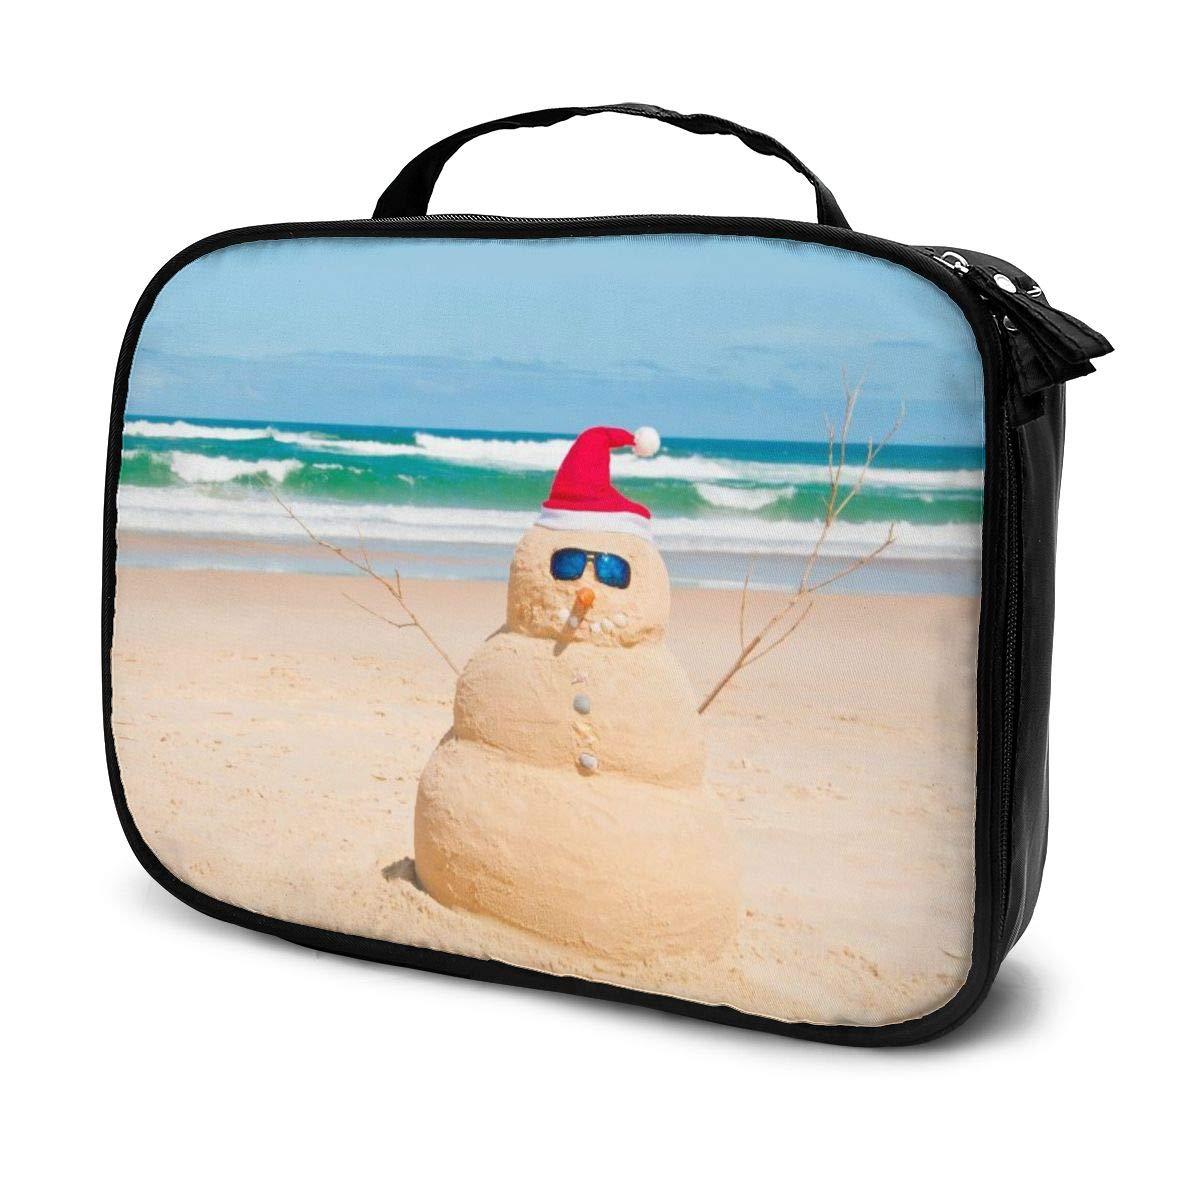 Premium Makeup Cosmetic Bag - Summer Australia Beach Snowman Large Capacity Travel Makeup Train Case - Multifunction Toiletry Storage Bag For Womens